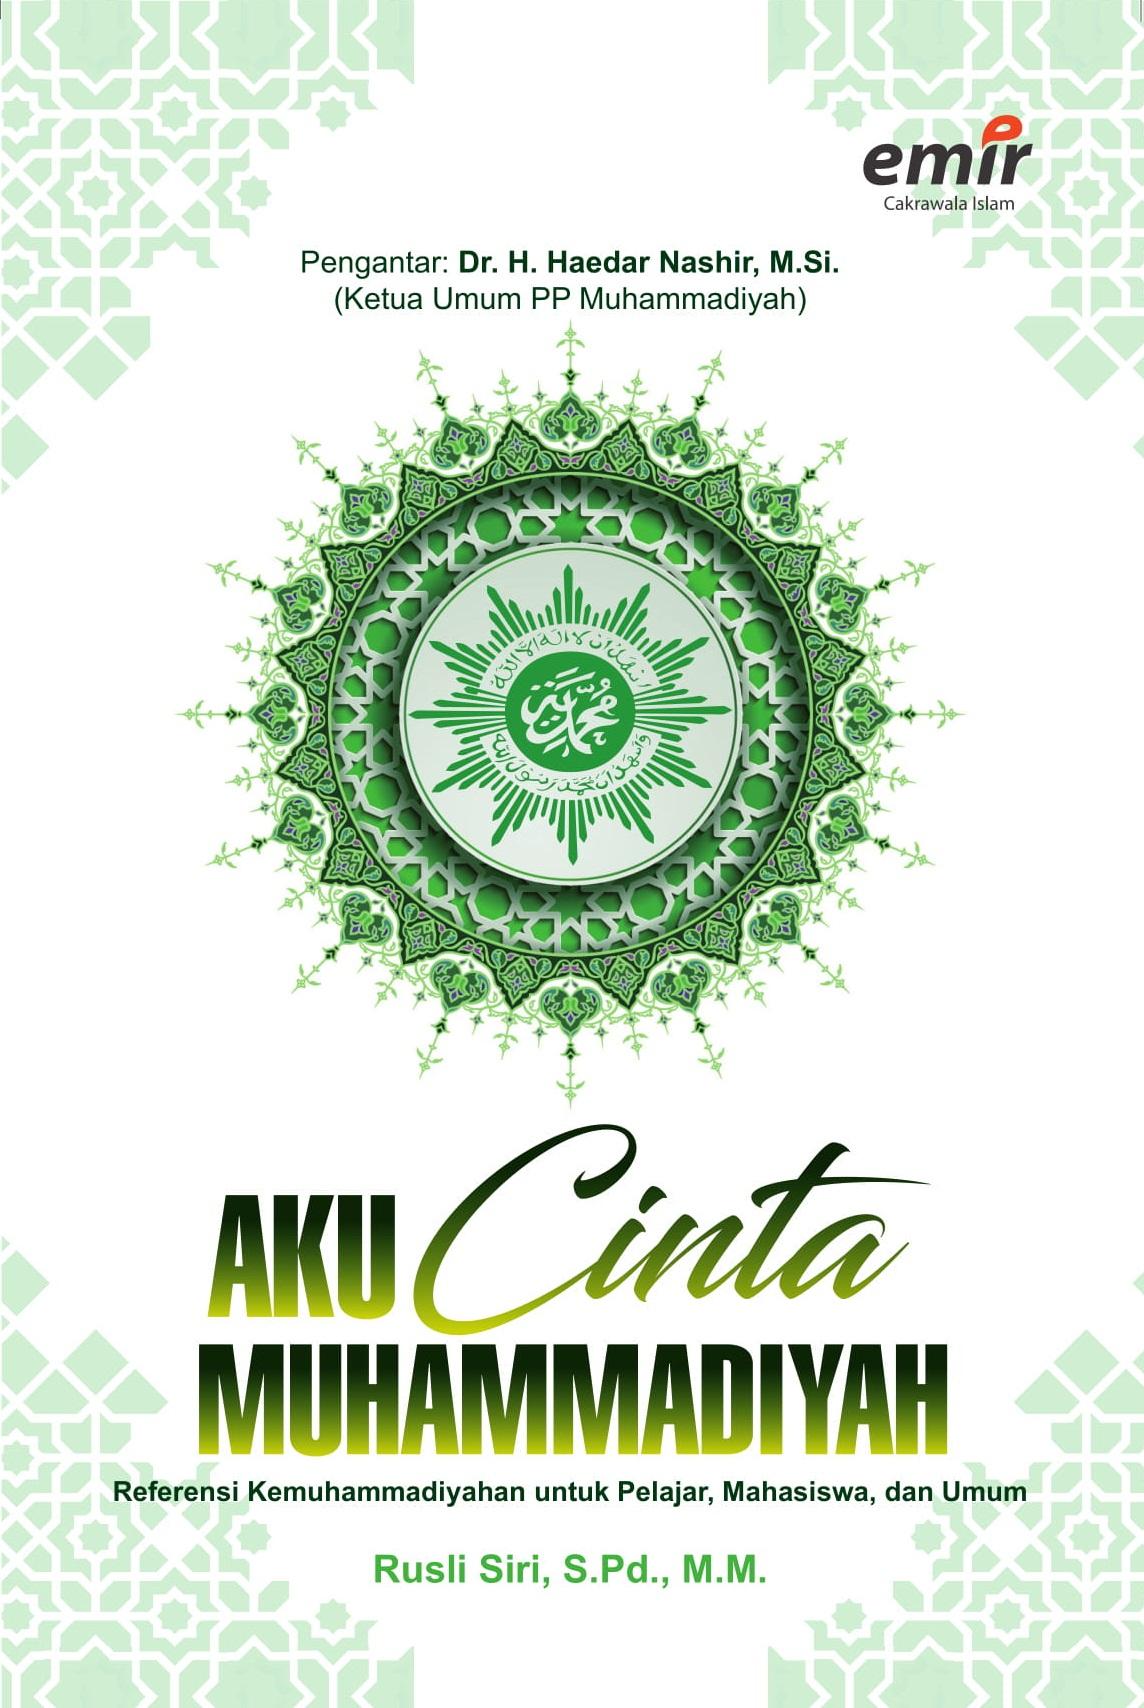 Aku Cinta Muhammadiyah